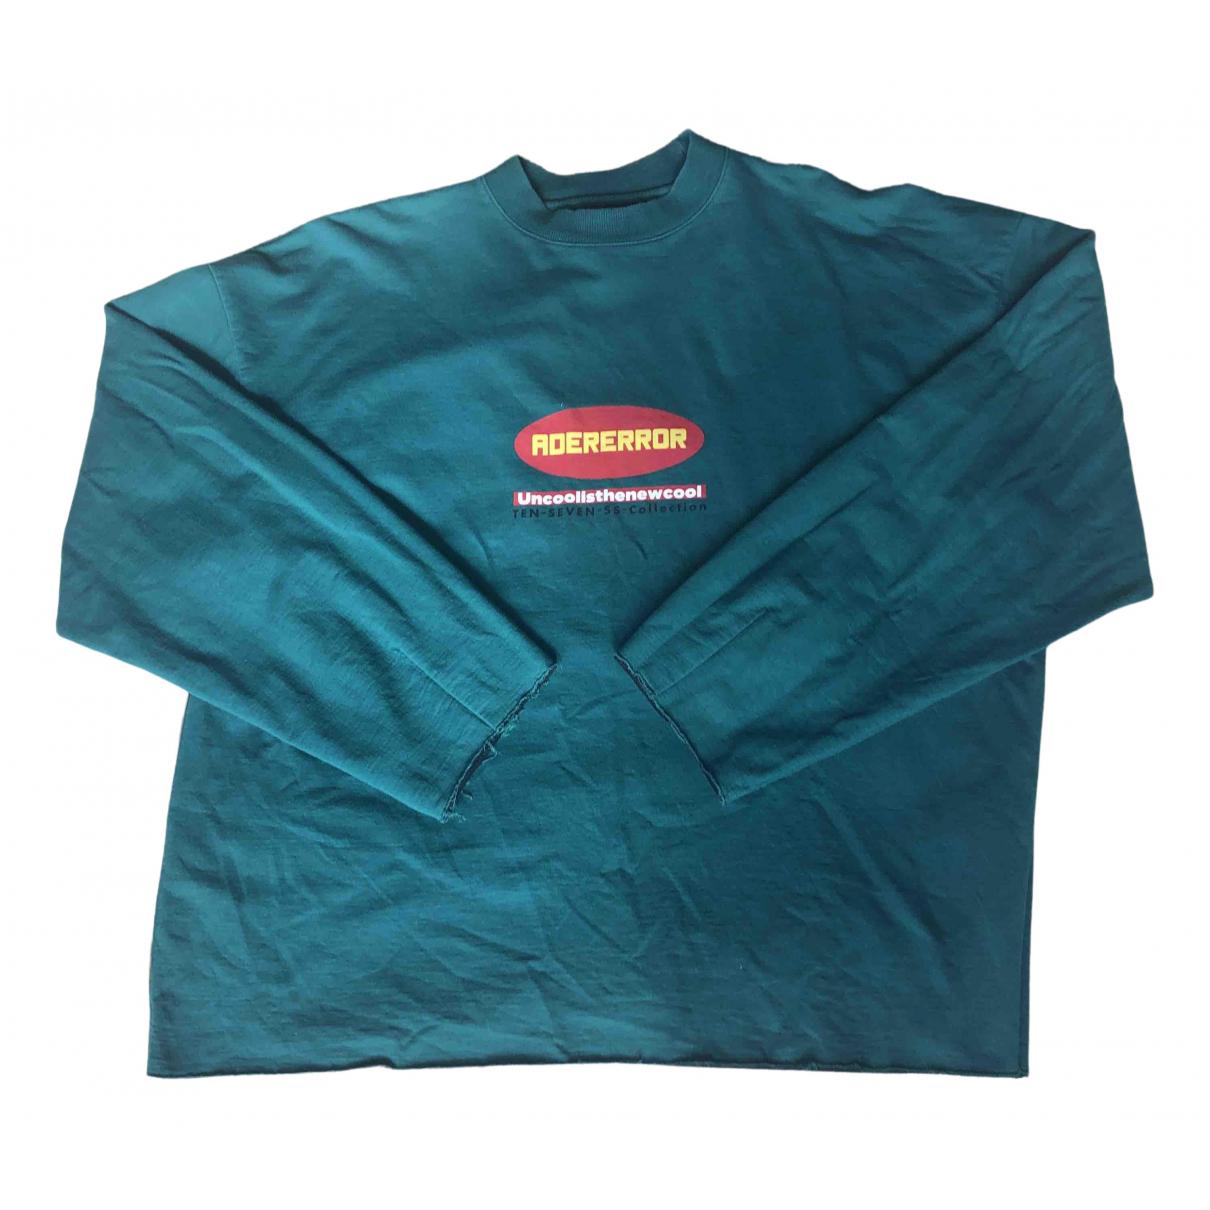 Ader Error Green Knitwear & Sweatshirt